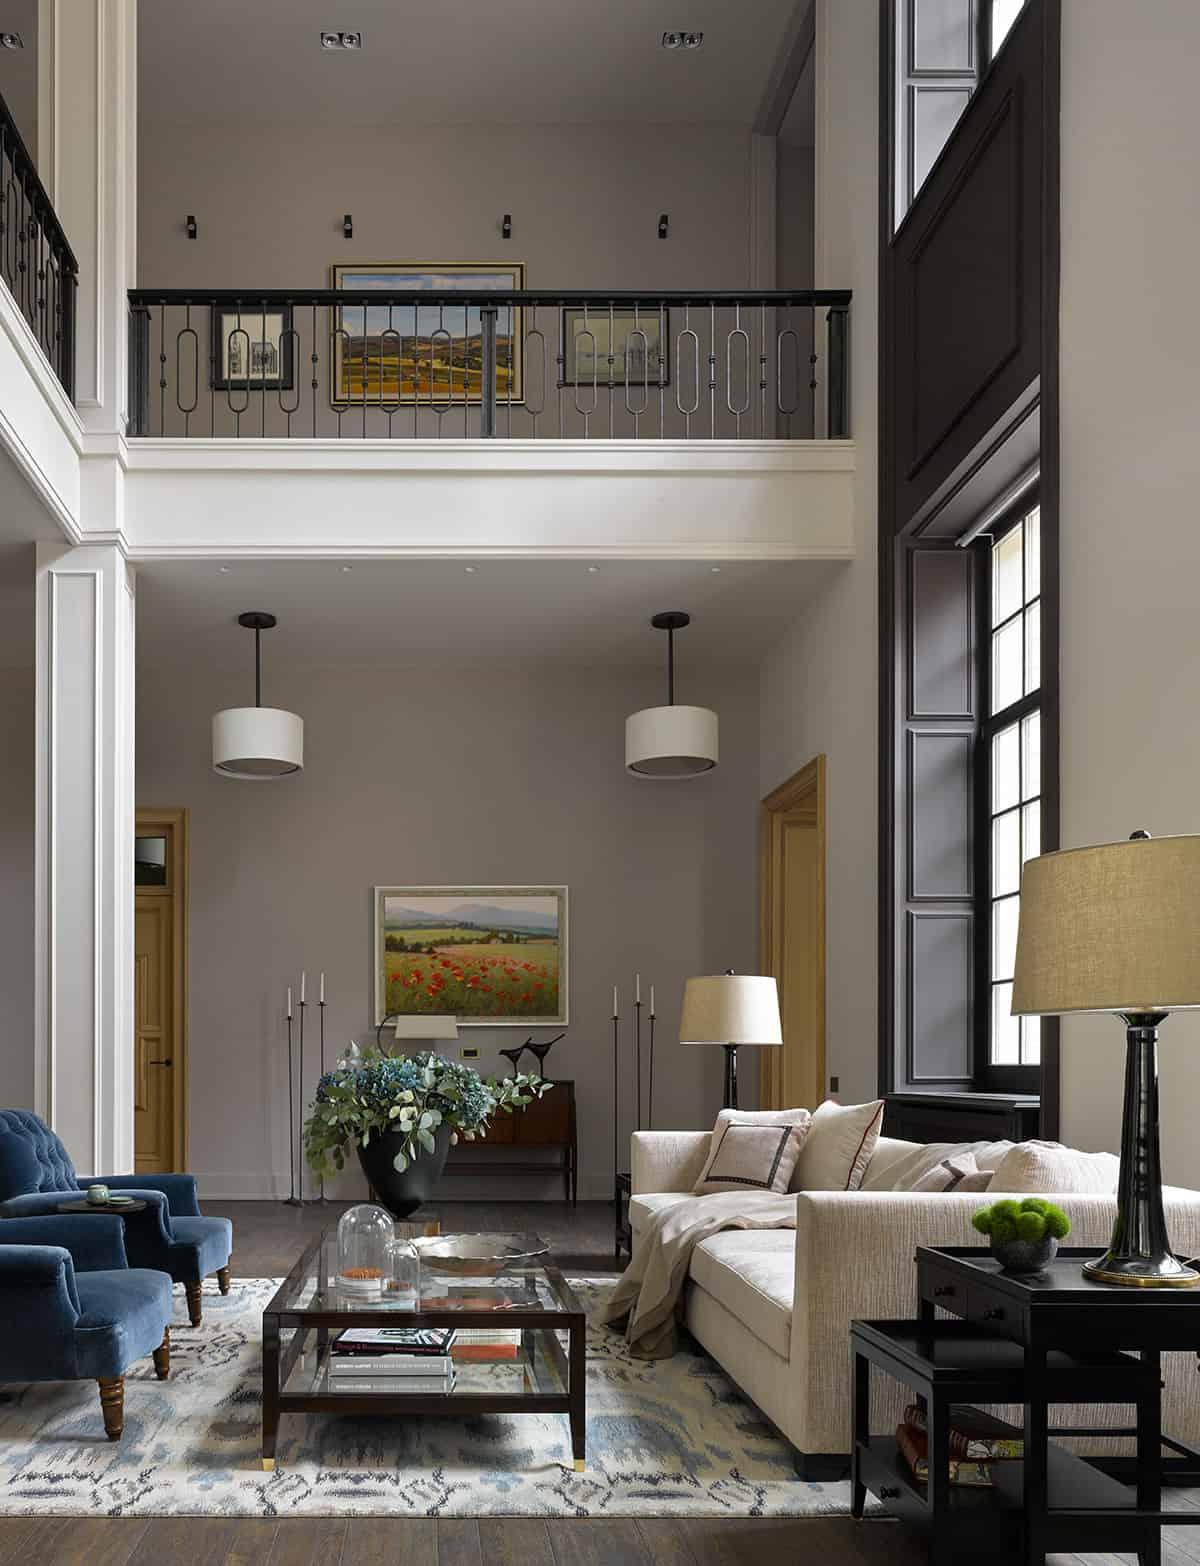 101 Beautiful Formal Living Room Design Ideas 2018 Images